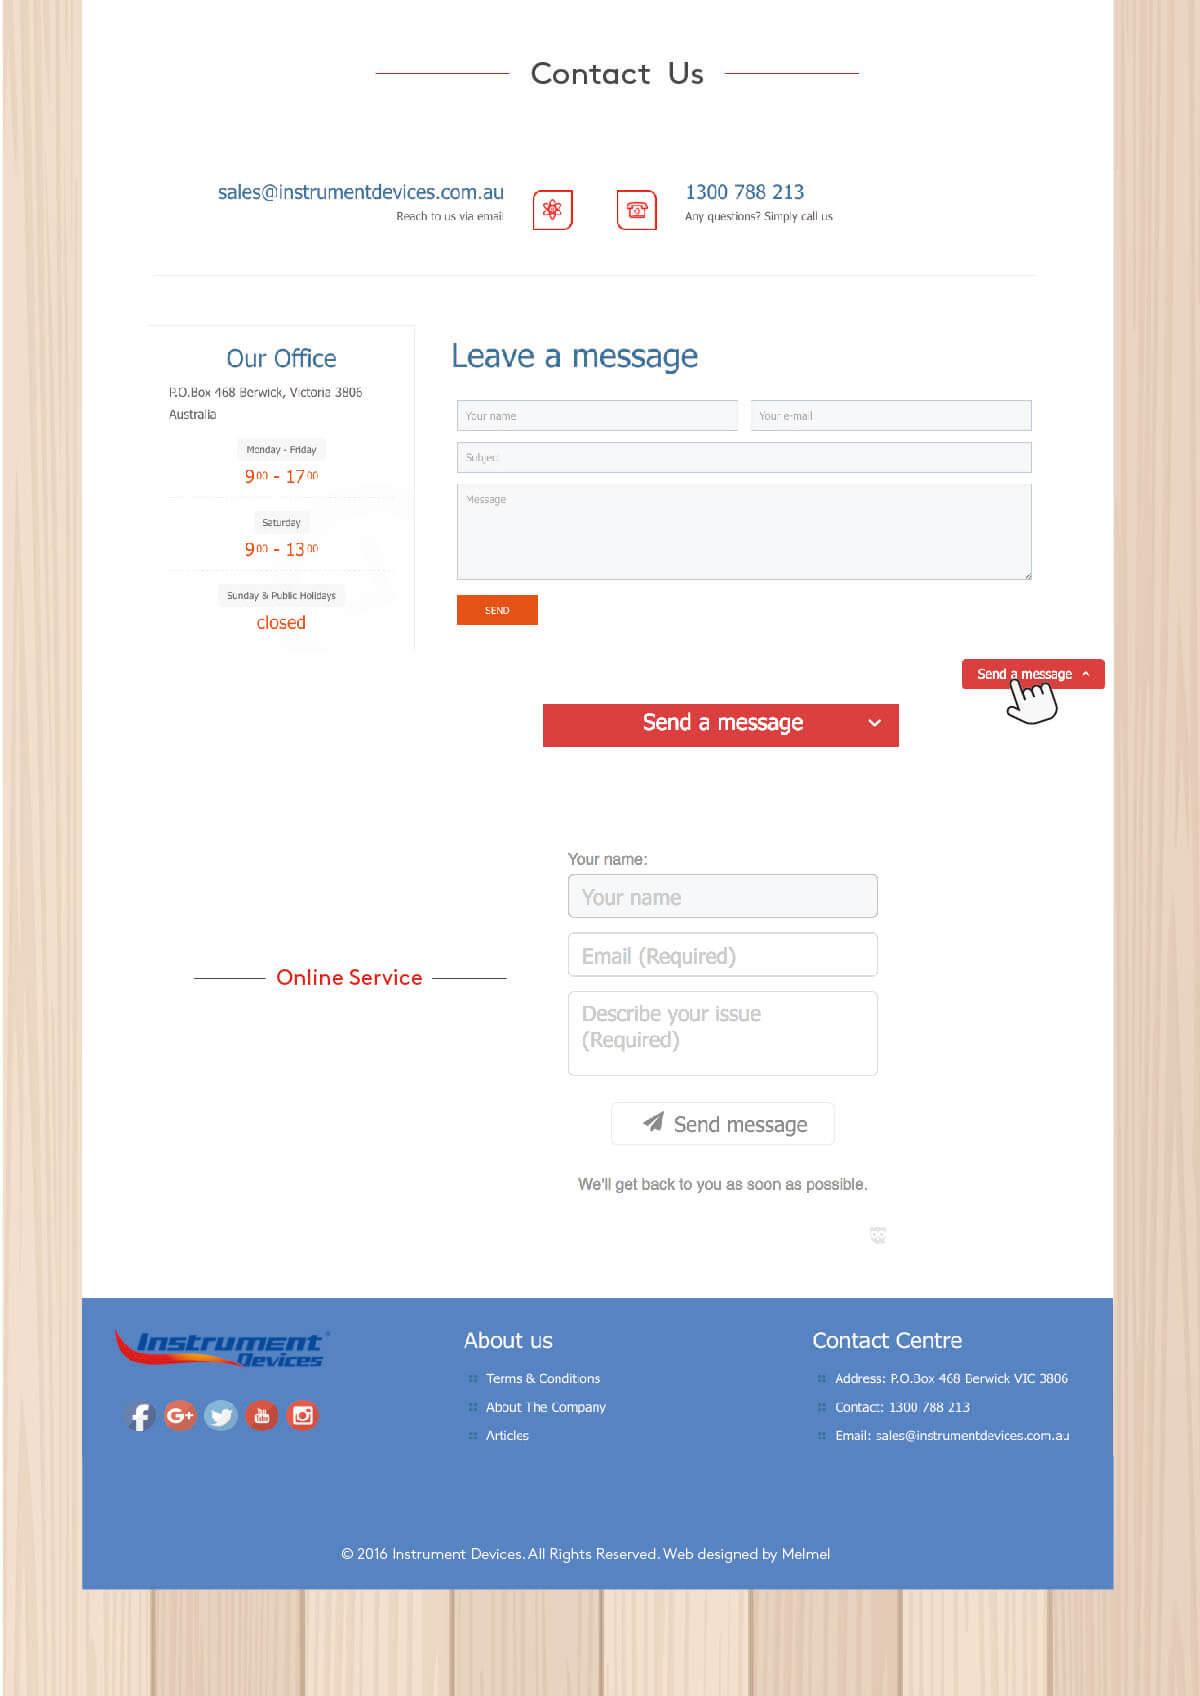 墨尔本Instrument Devices网站设计